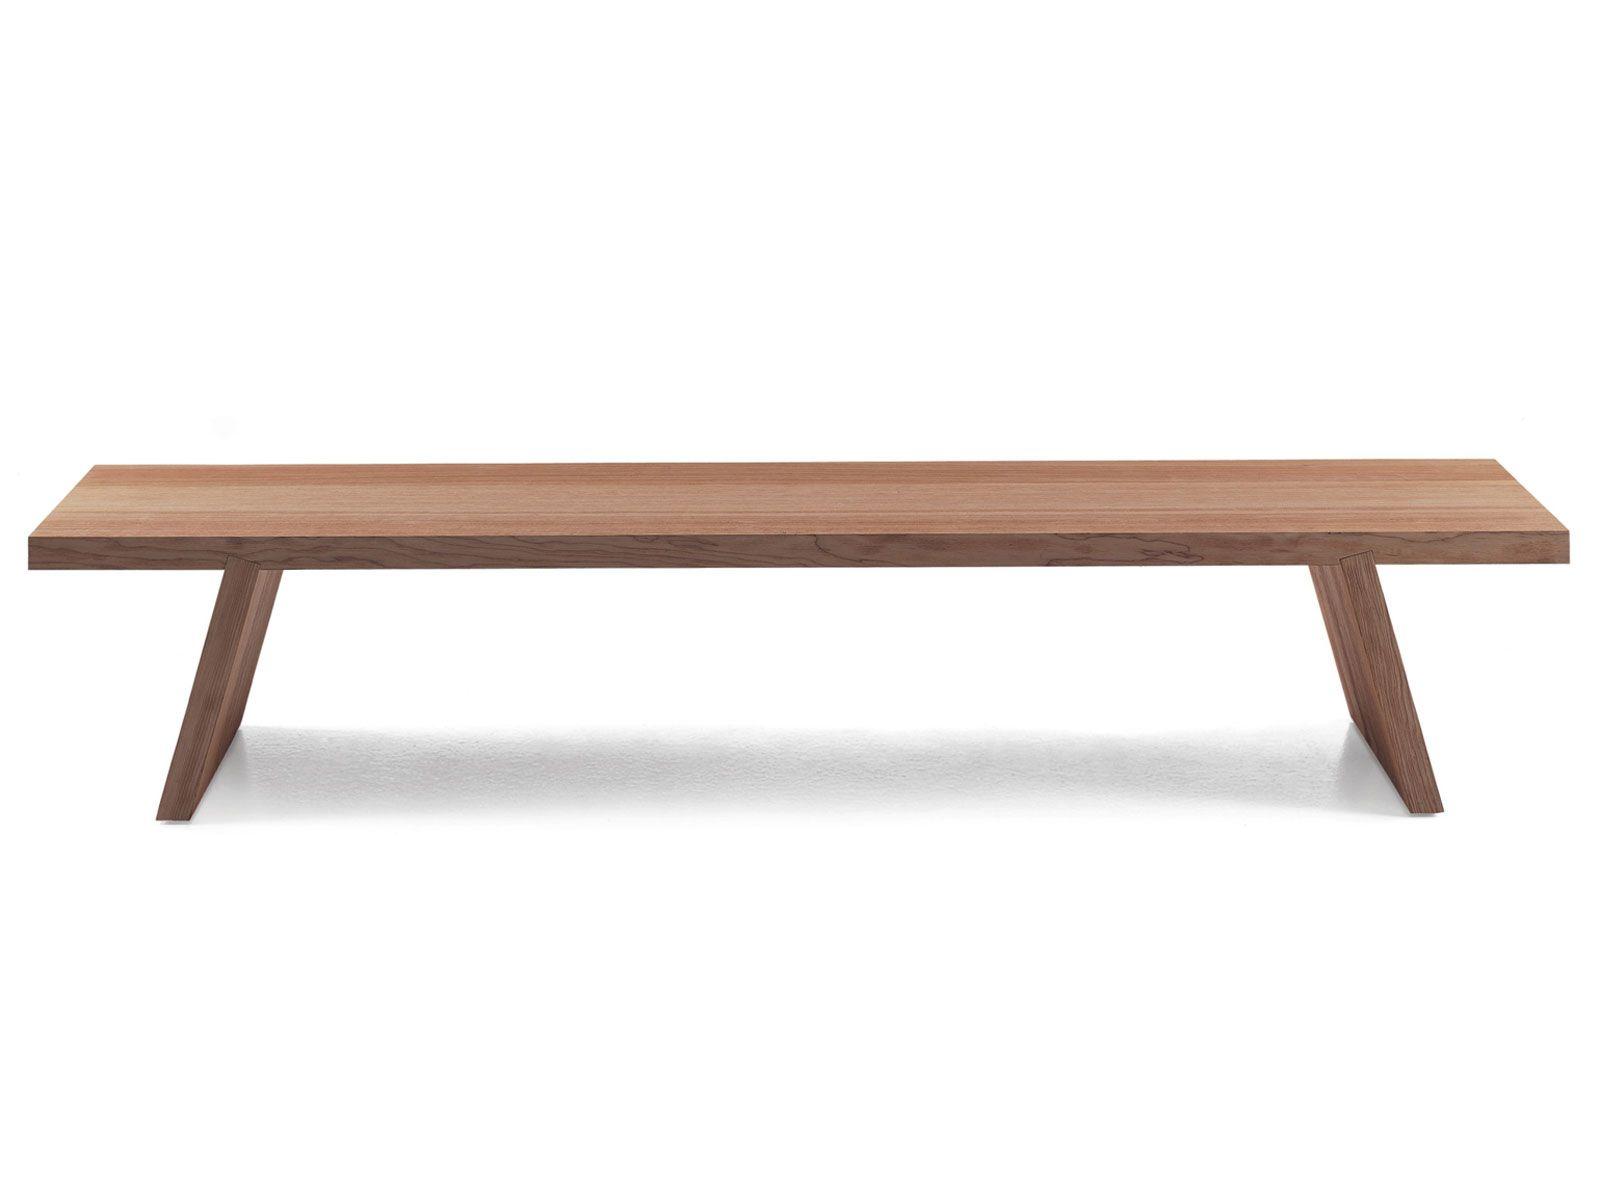 Bathroom Bench wooden bench | wooden bench | pinterest | bathroom bench and